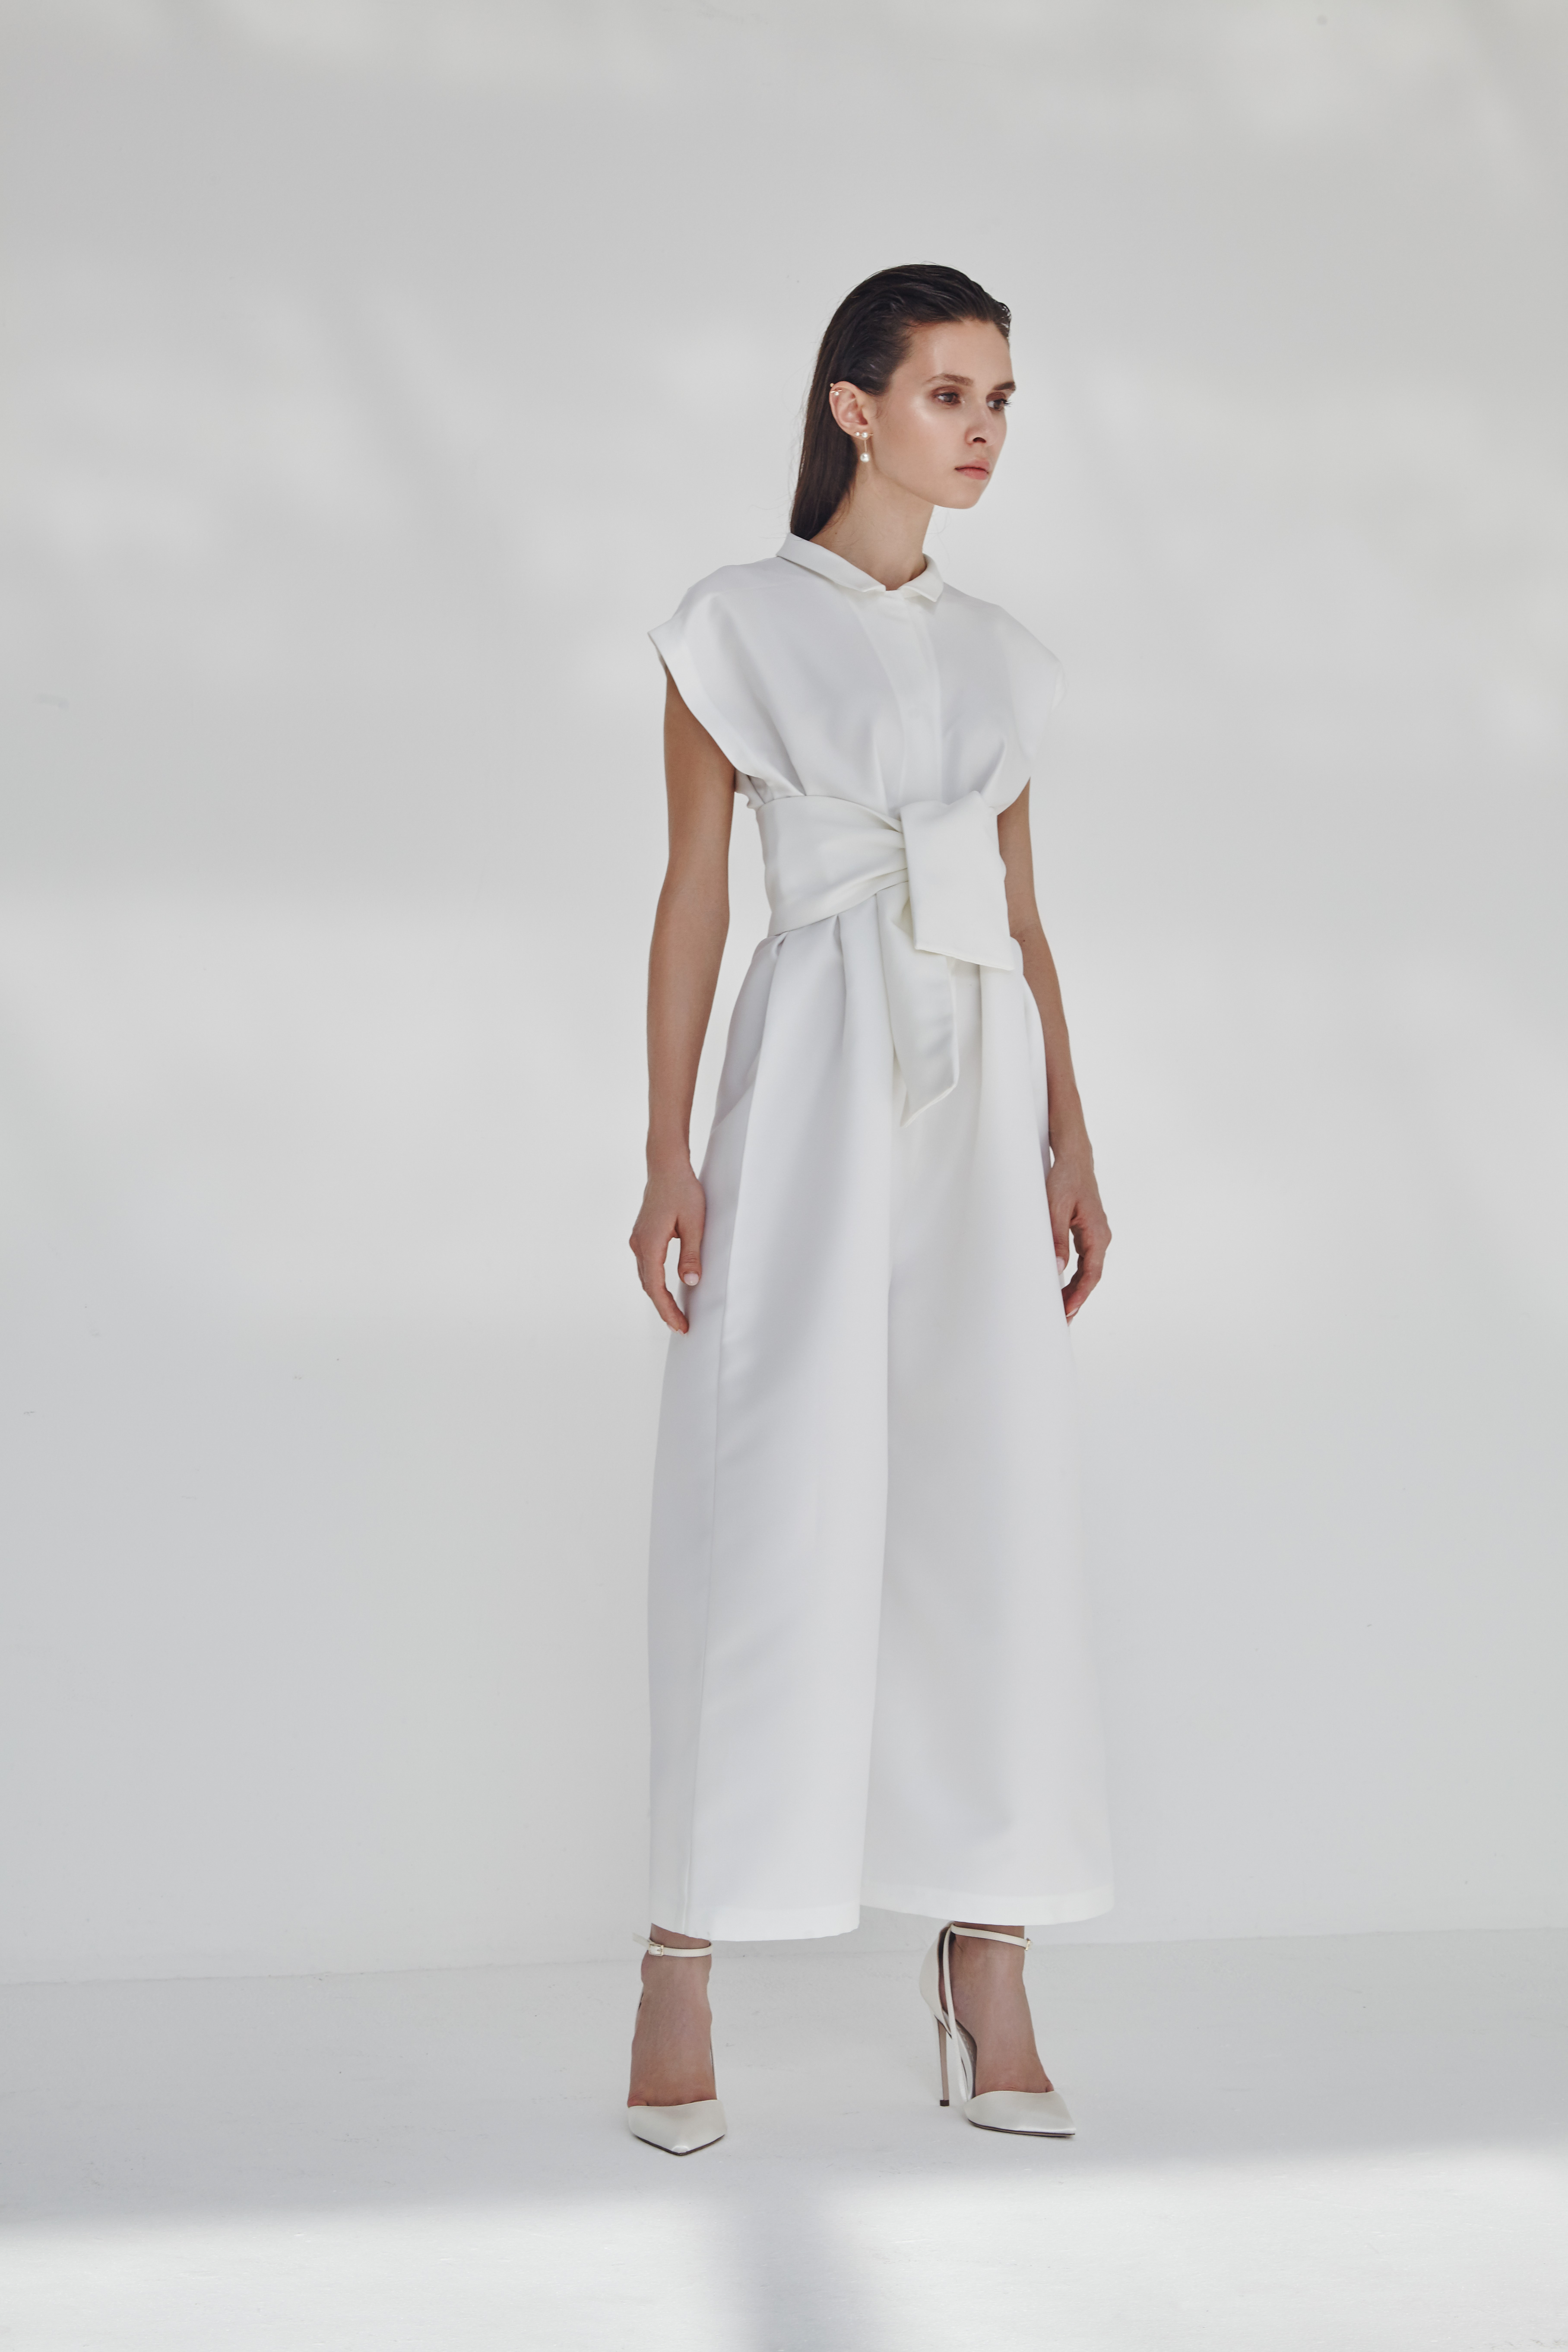 3.10-white-lookbook